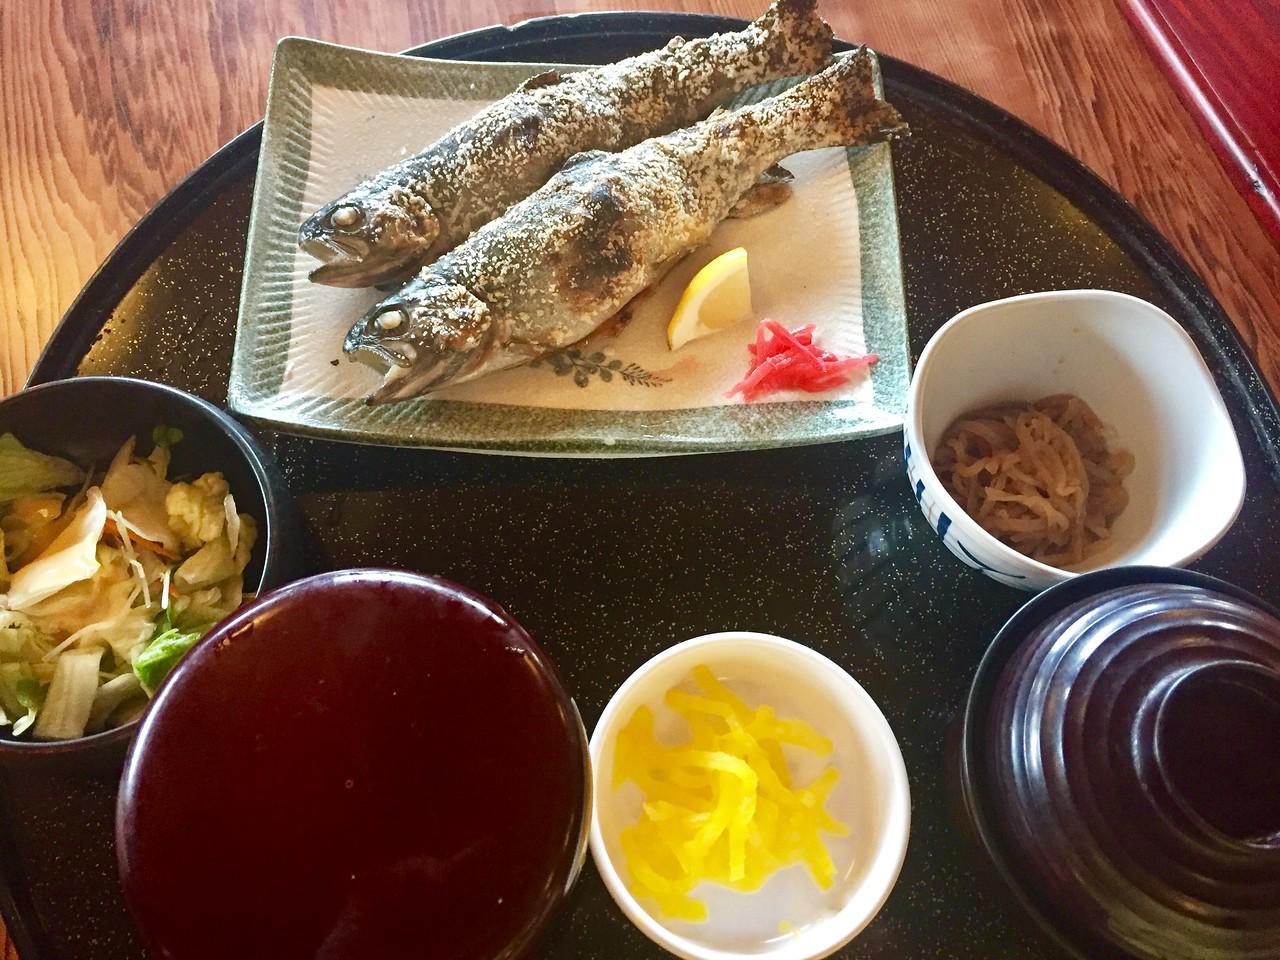 Vicky's fish dinner